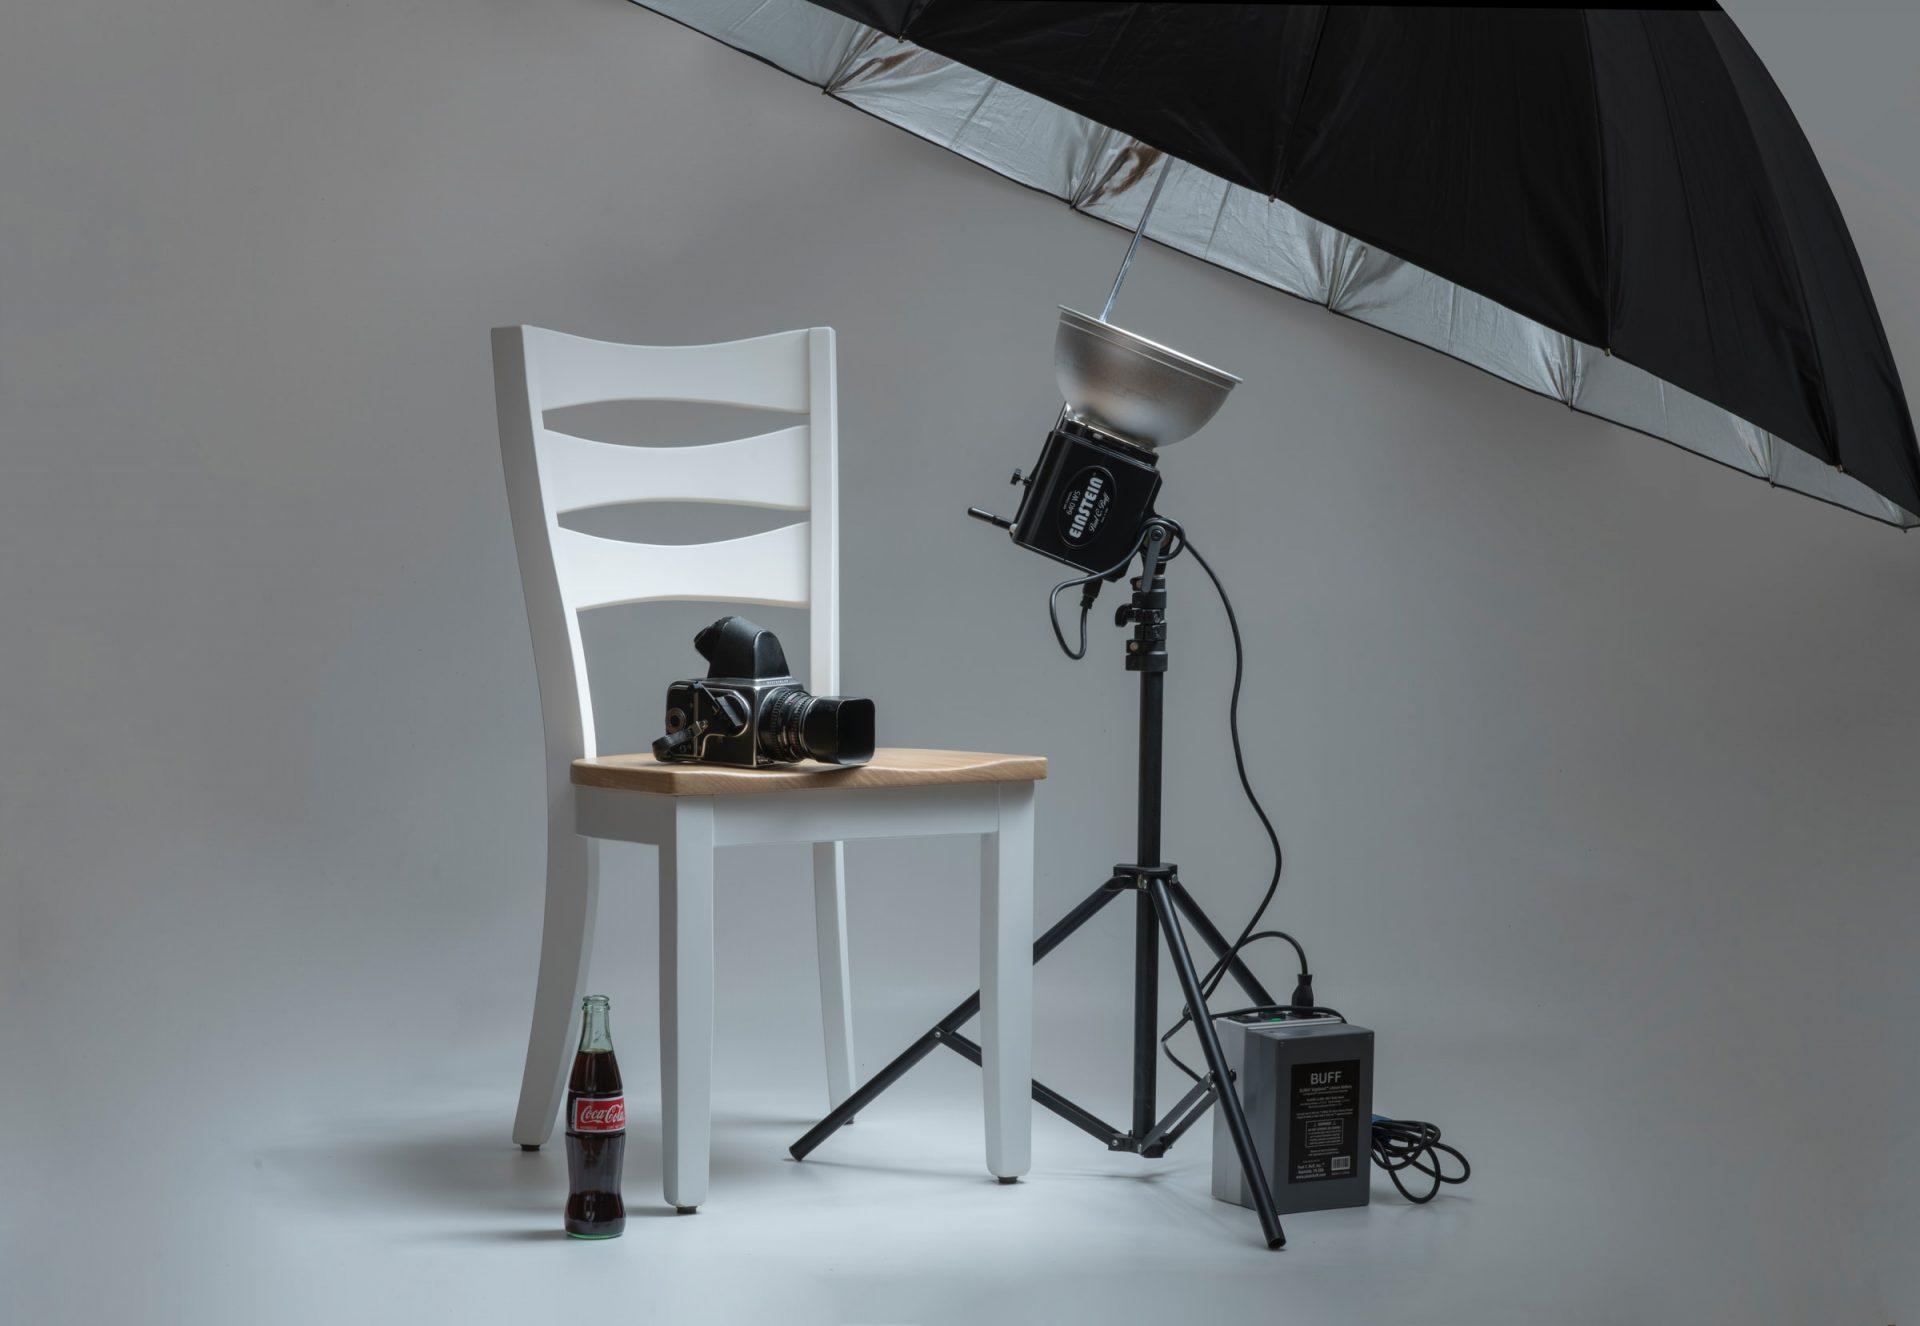 Foto Produk yang Bagus - Shaniba Creative Industry